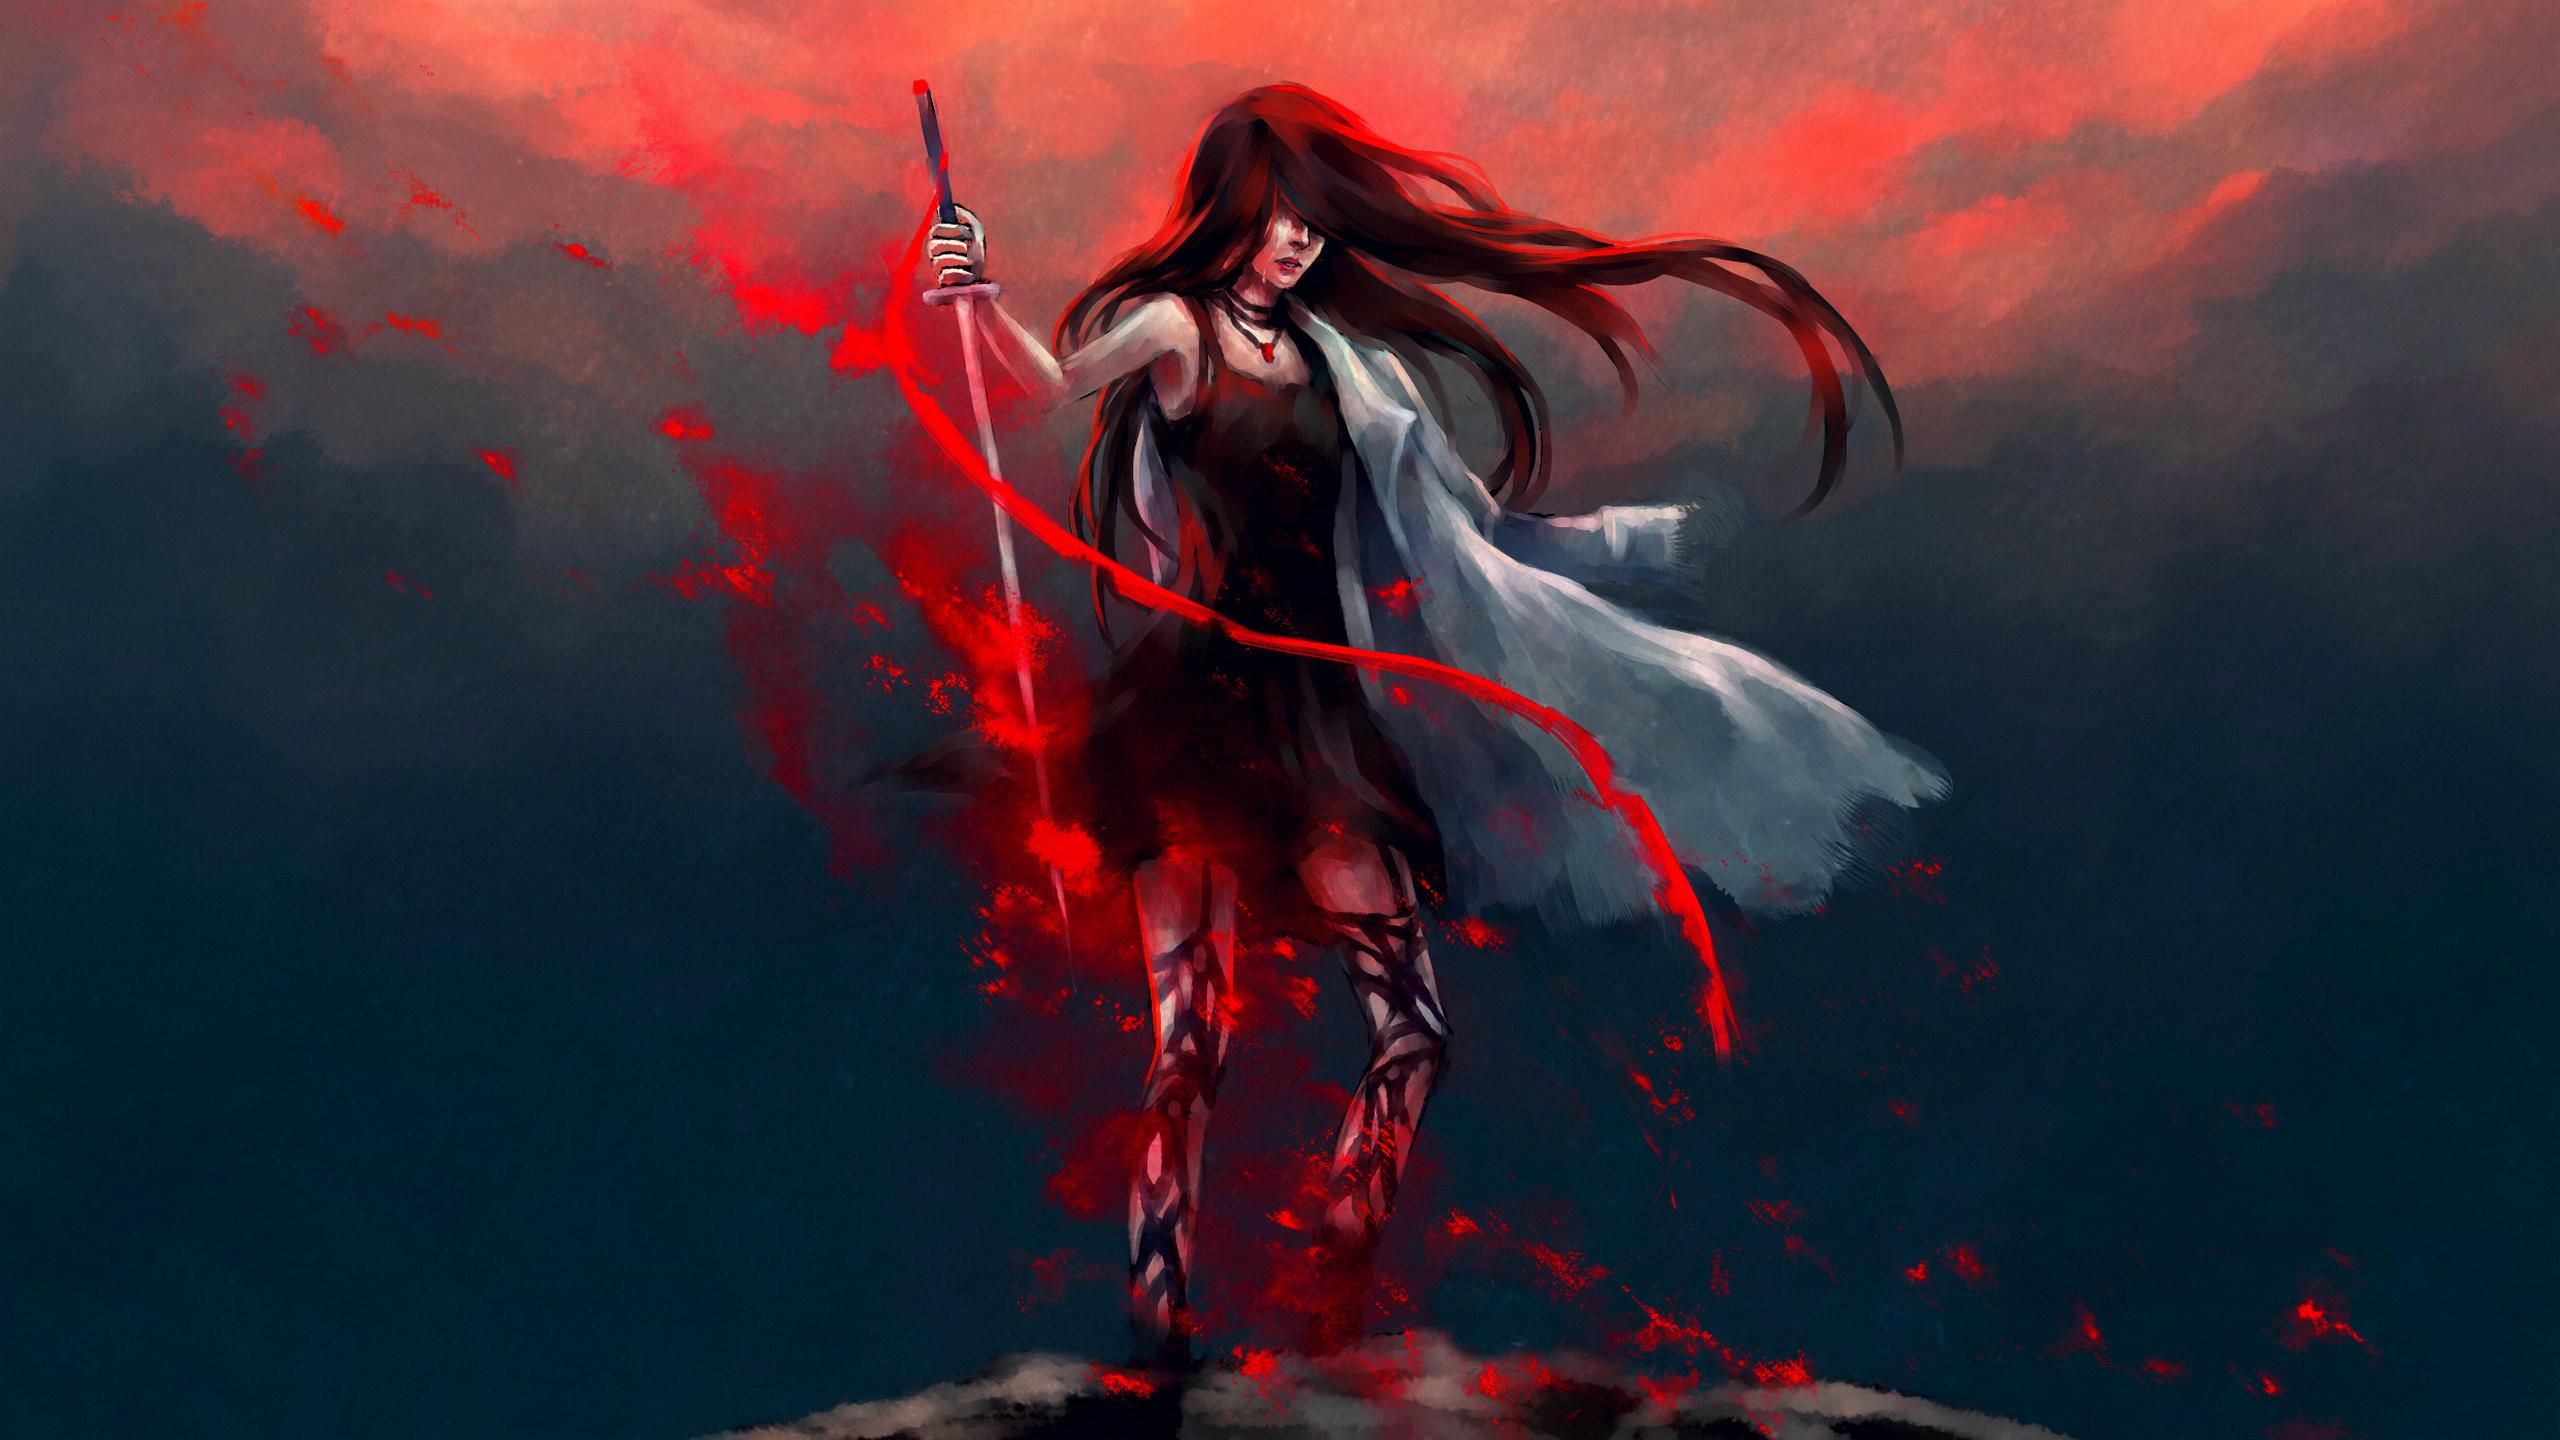 Samurai Girl Wallpaper (76+ images)